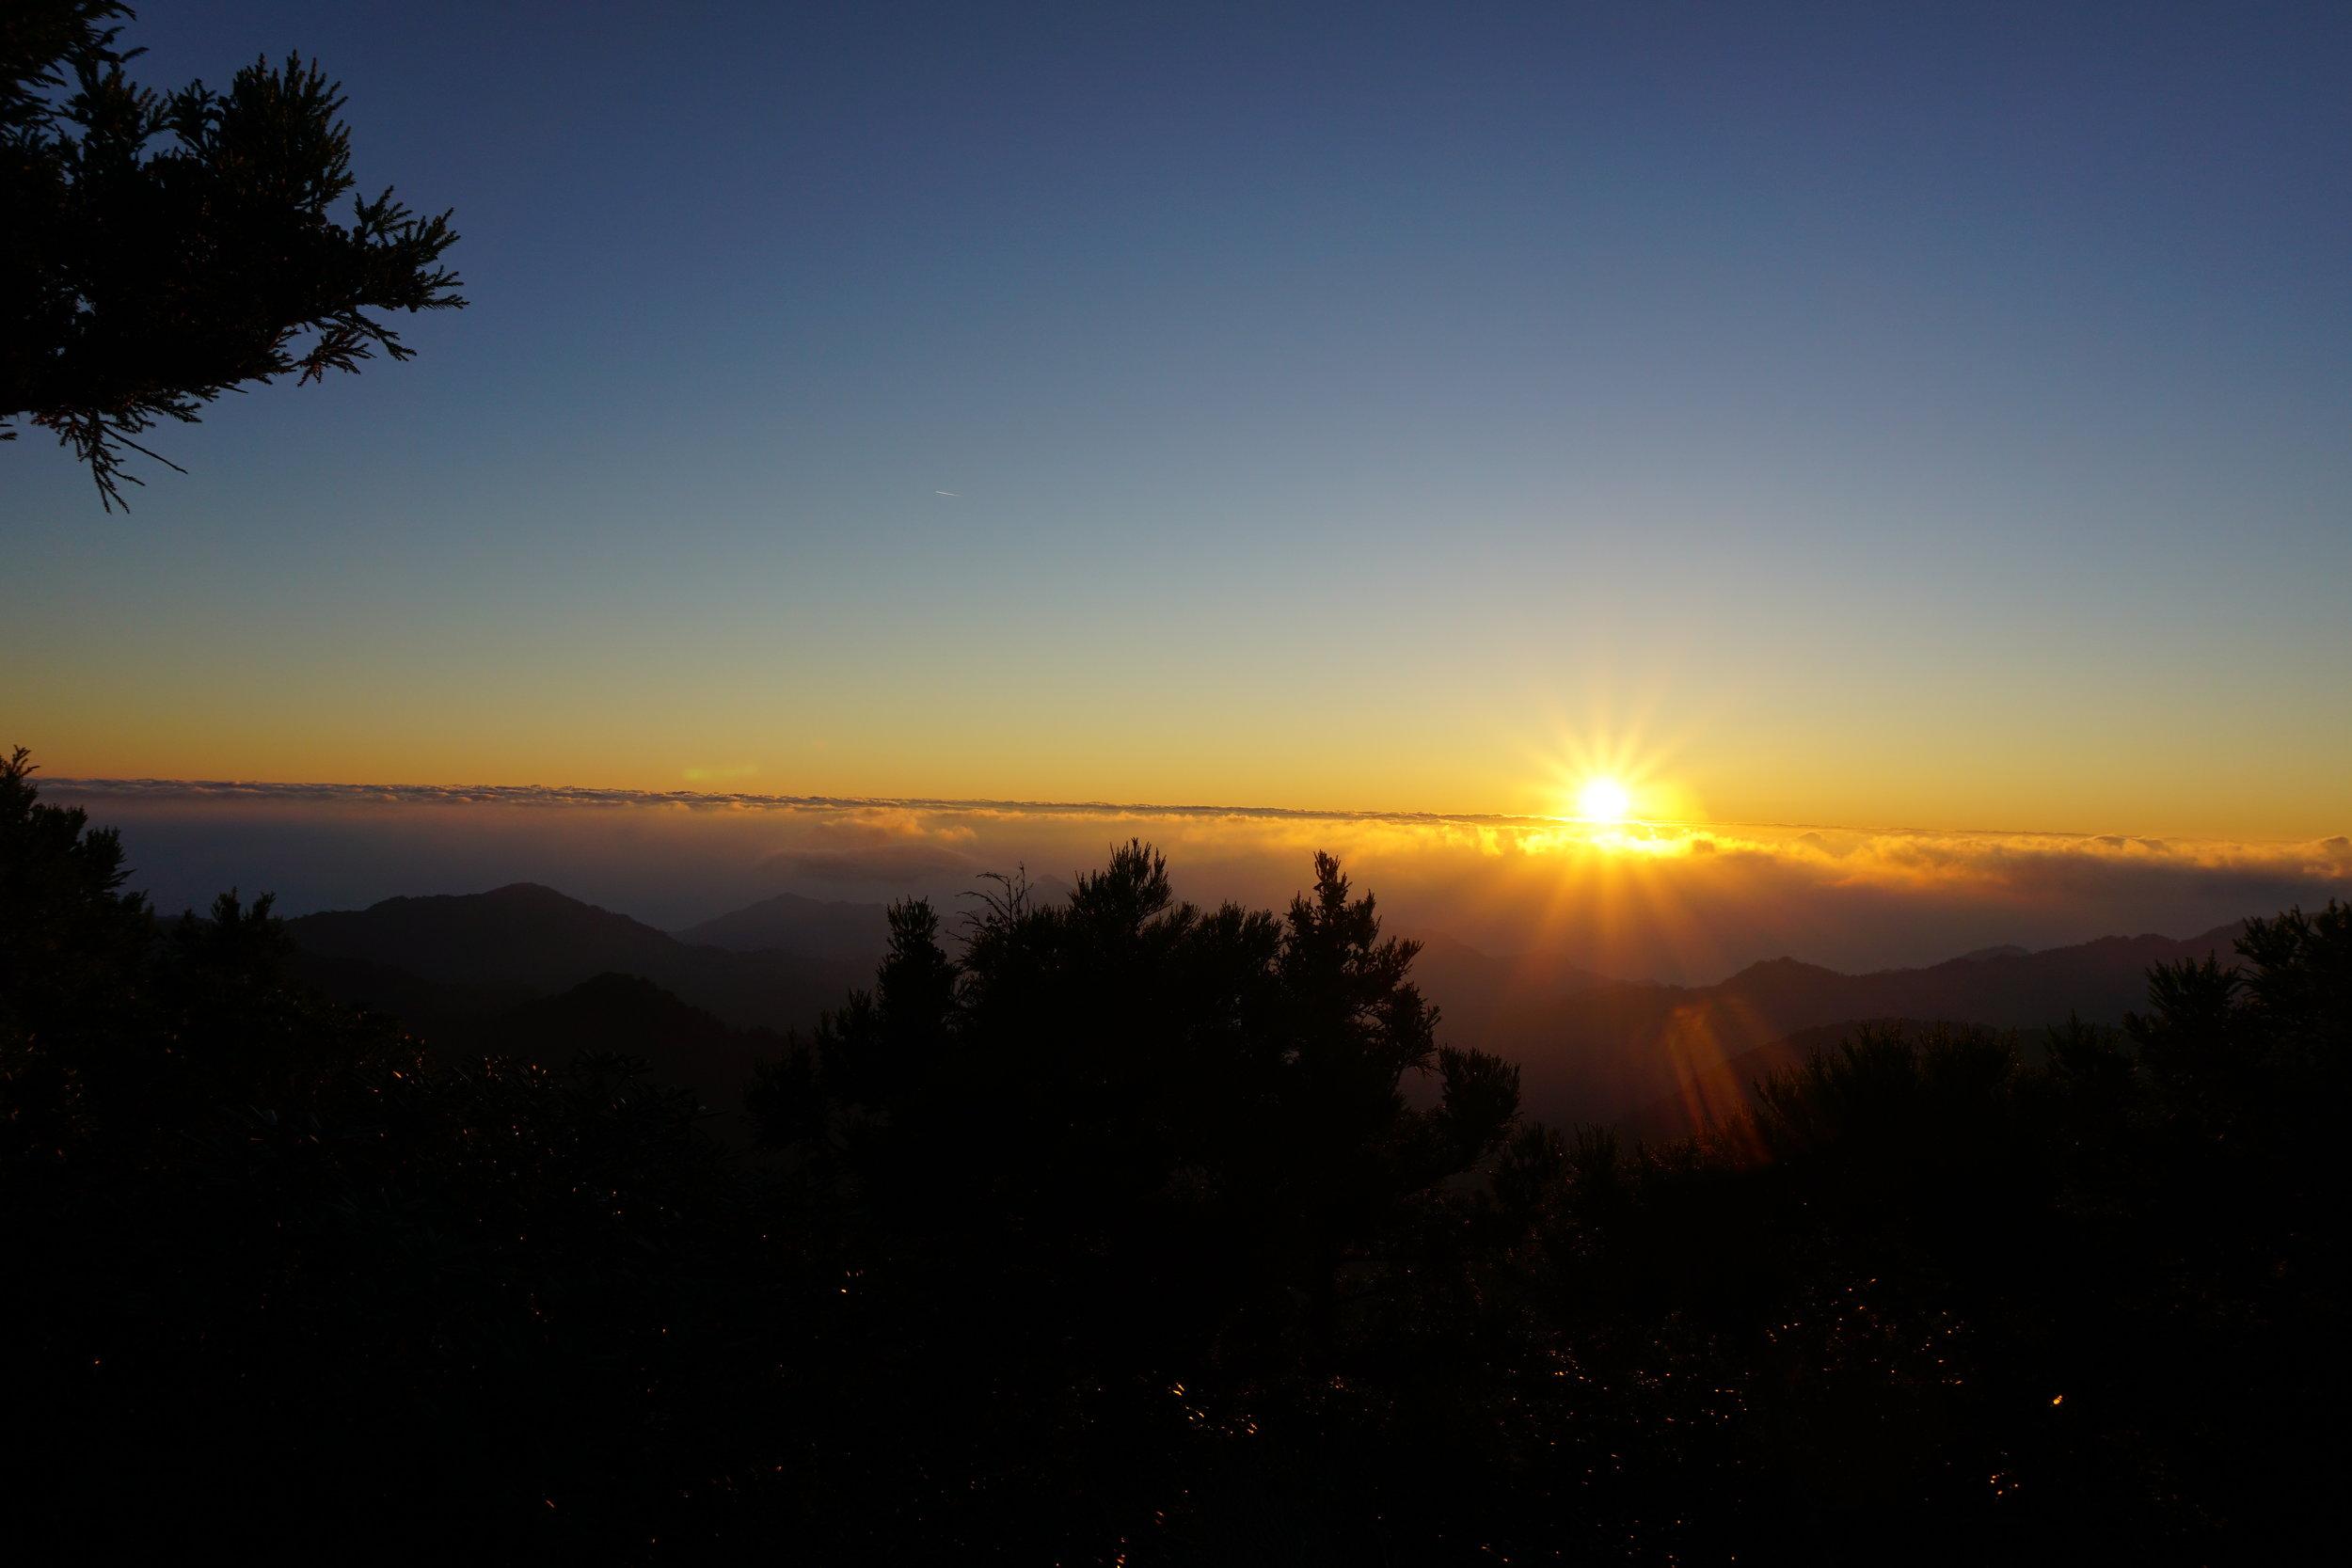 Sunrise on the second day of the Miyanouradake hike!